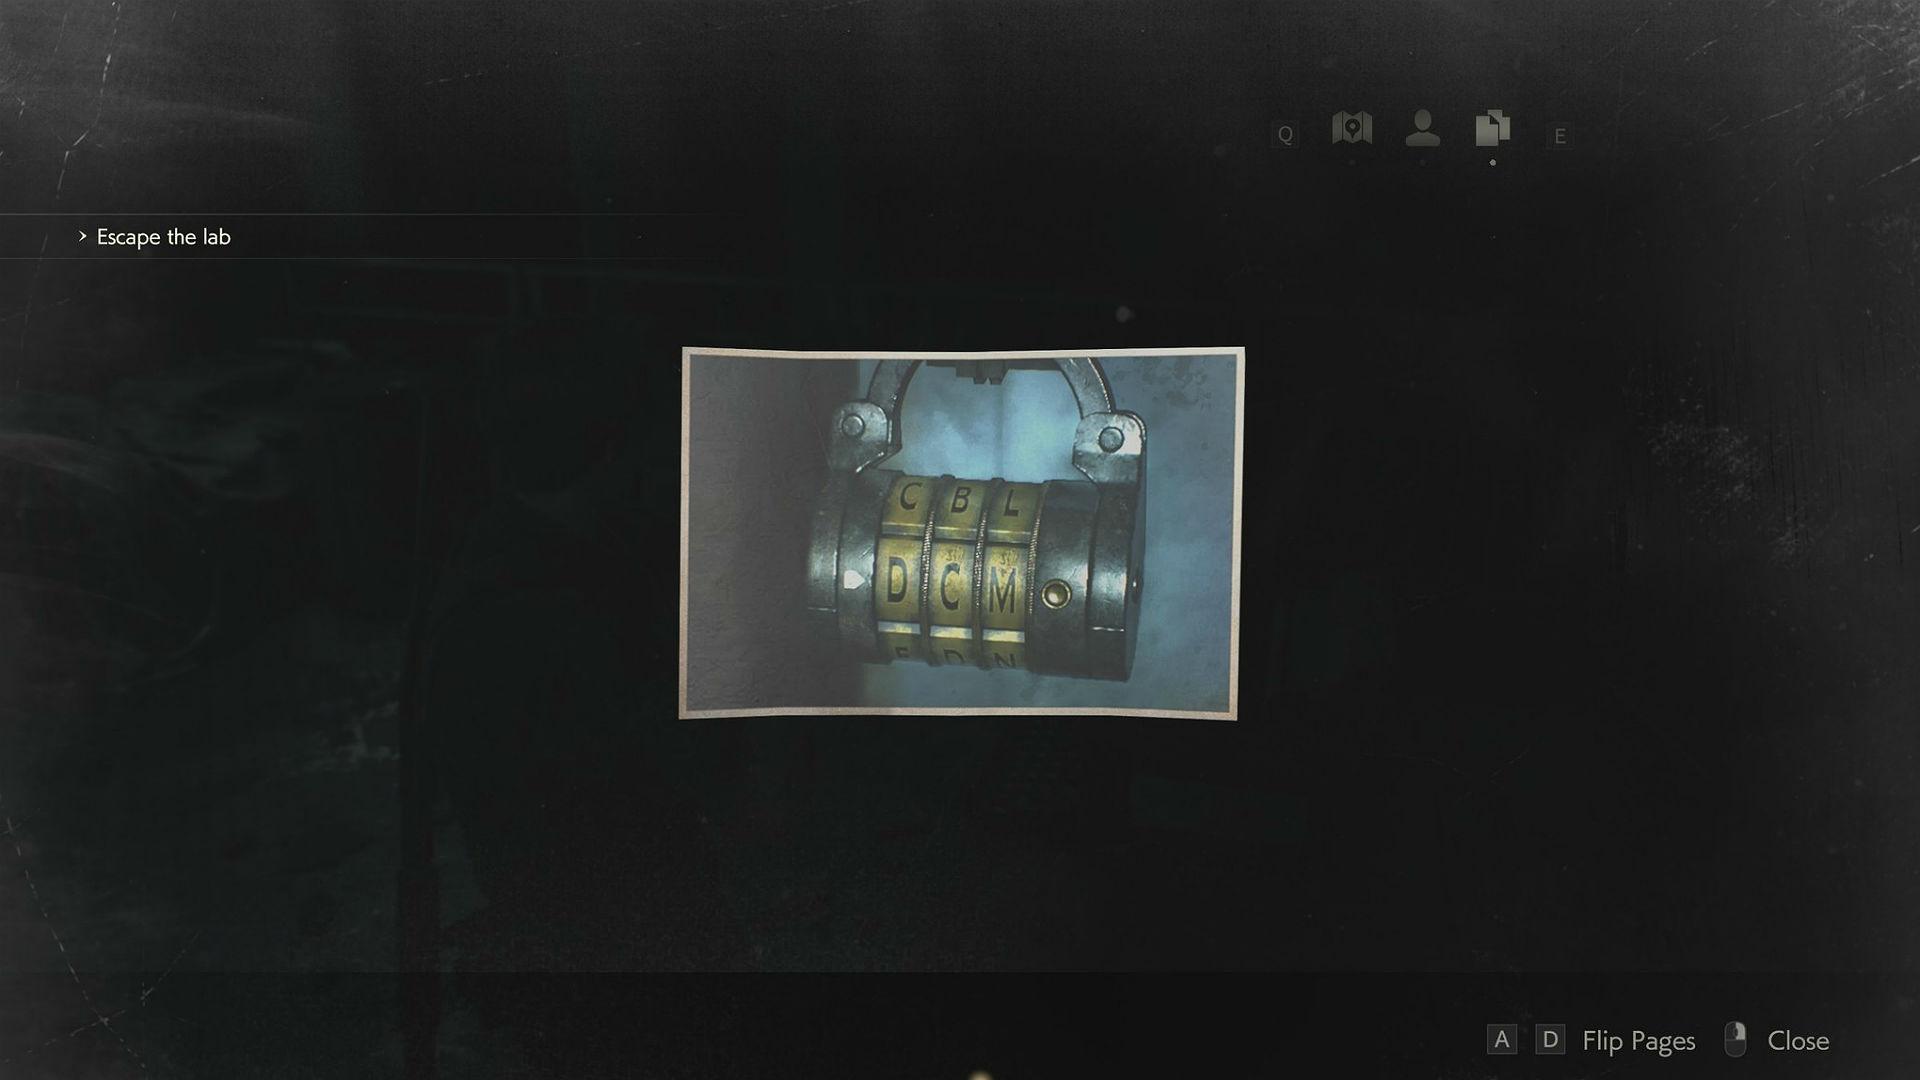 Resident Evil 2 Remake locker codes: how to unlock all lockers